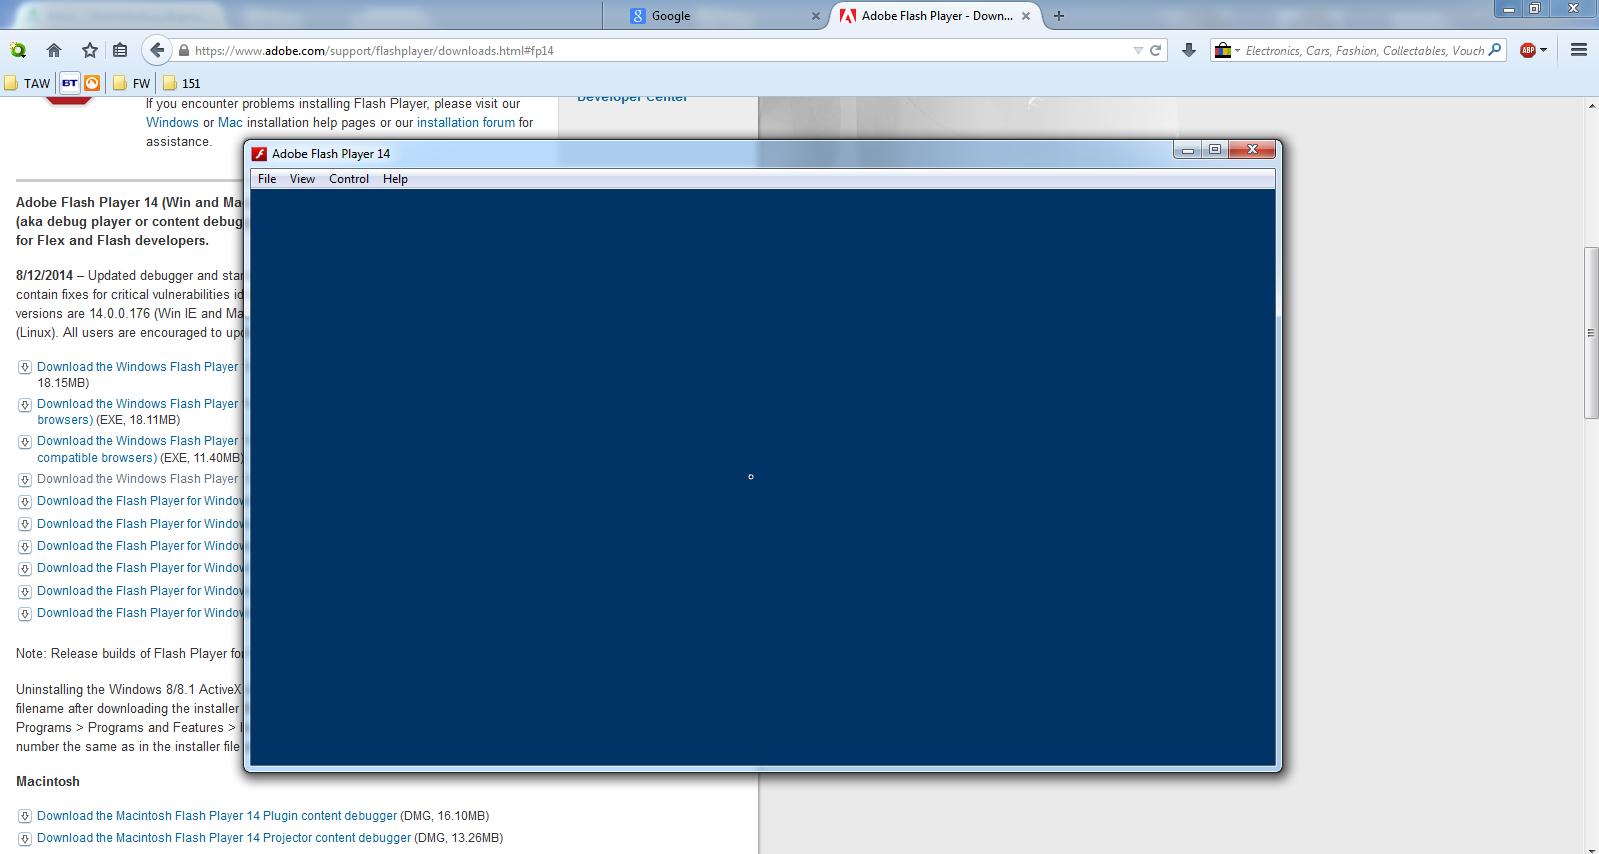 Adobe flash player file location